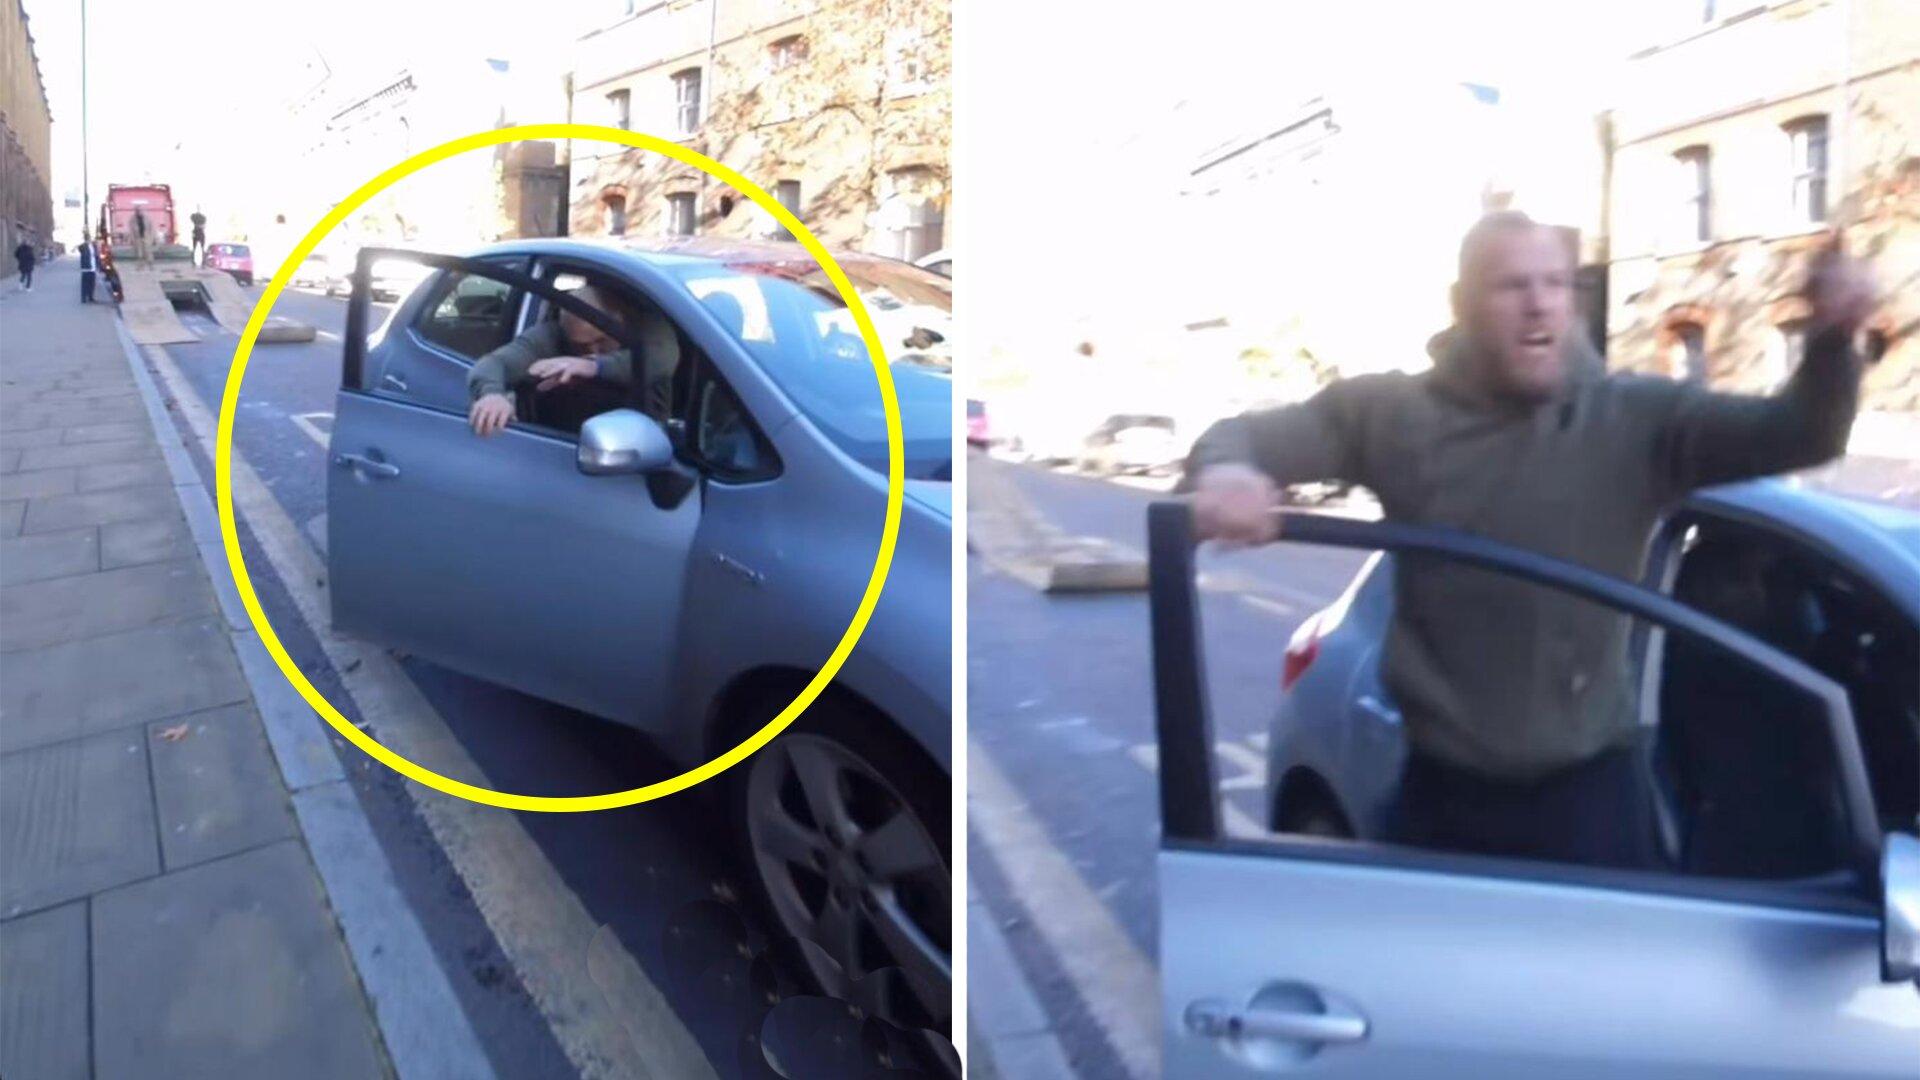 Investigation underway as James Haskell road rage footage emerges